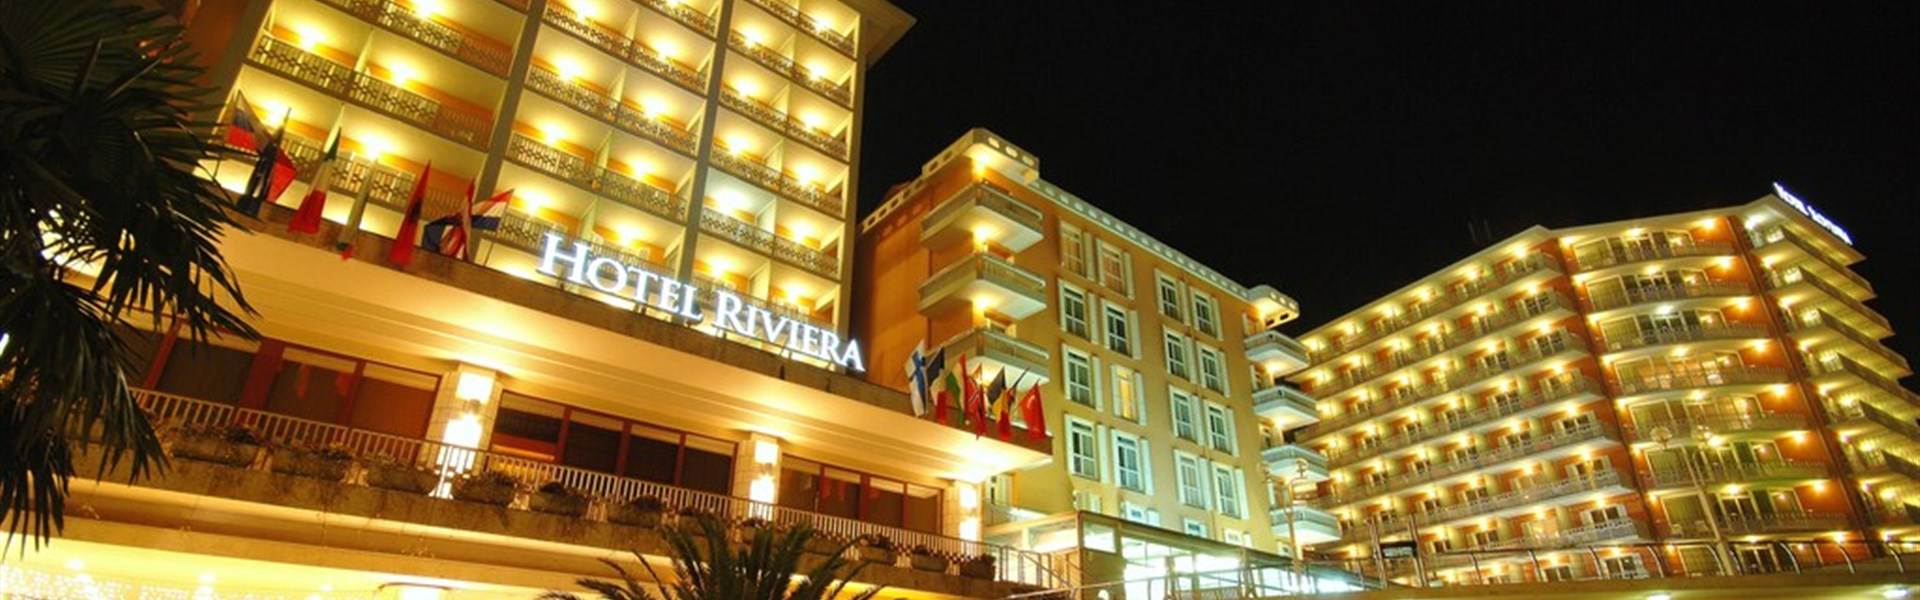 Marco Polo - Life Class Hotel Riviera -